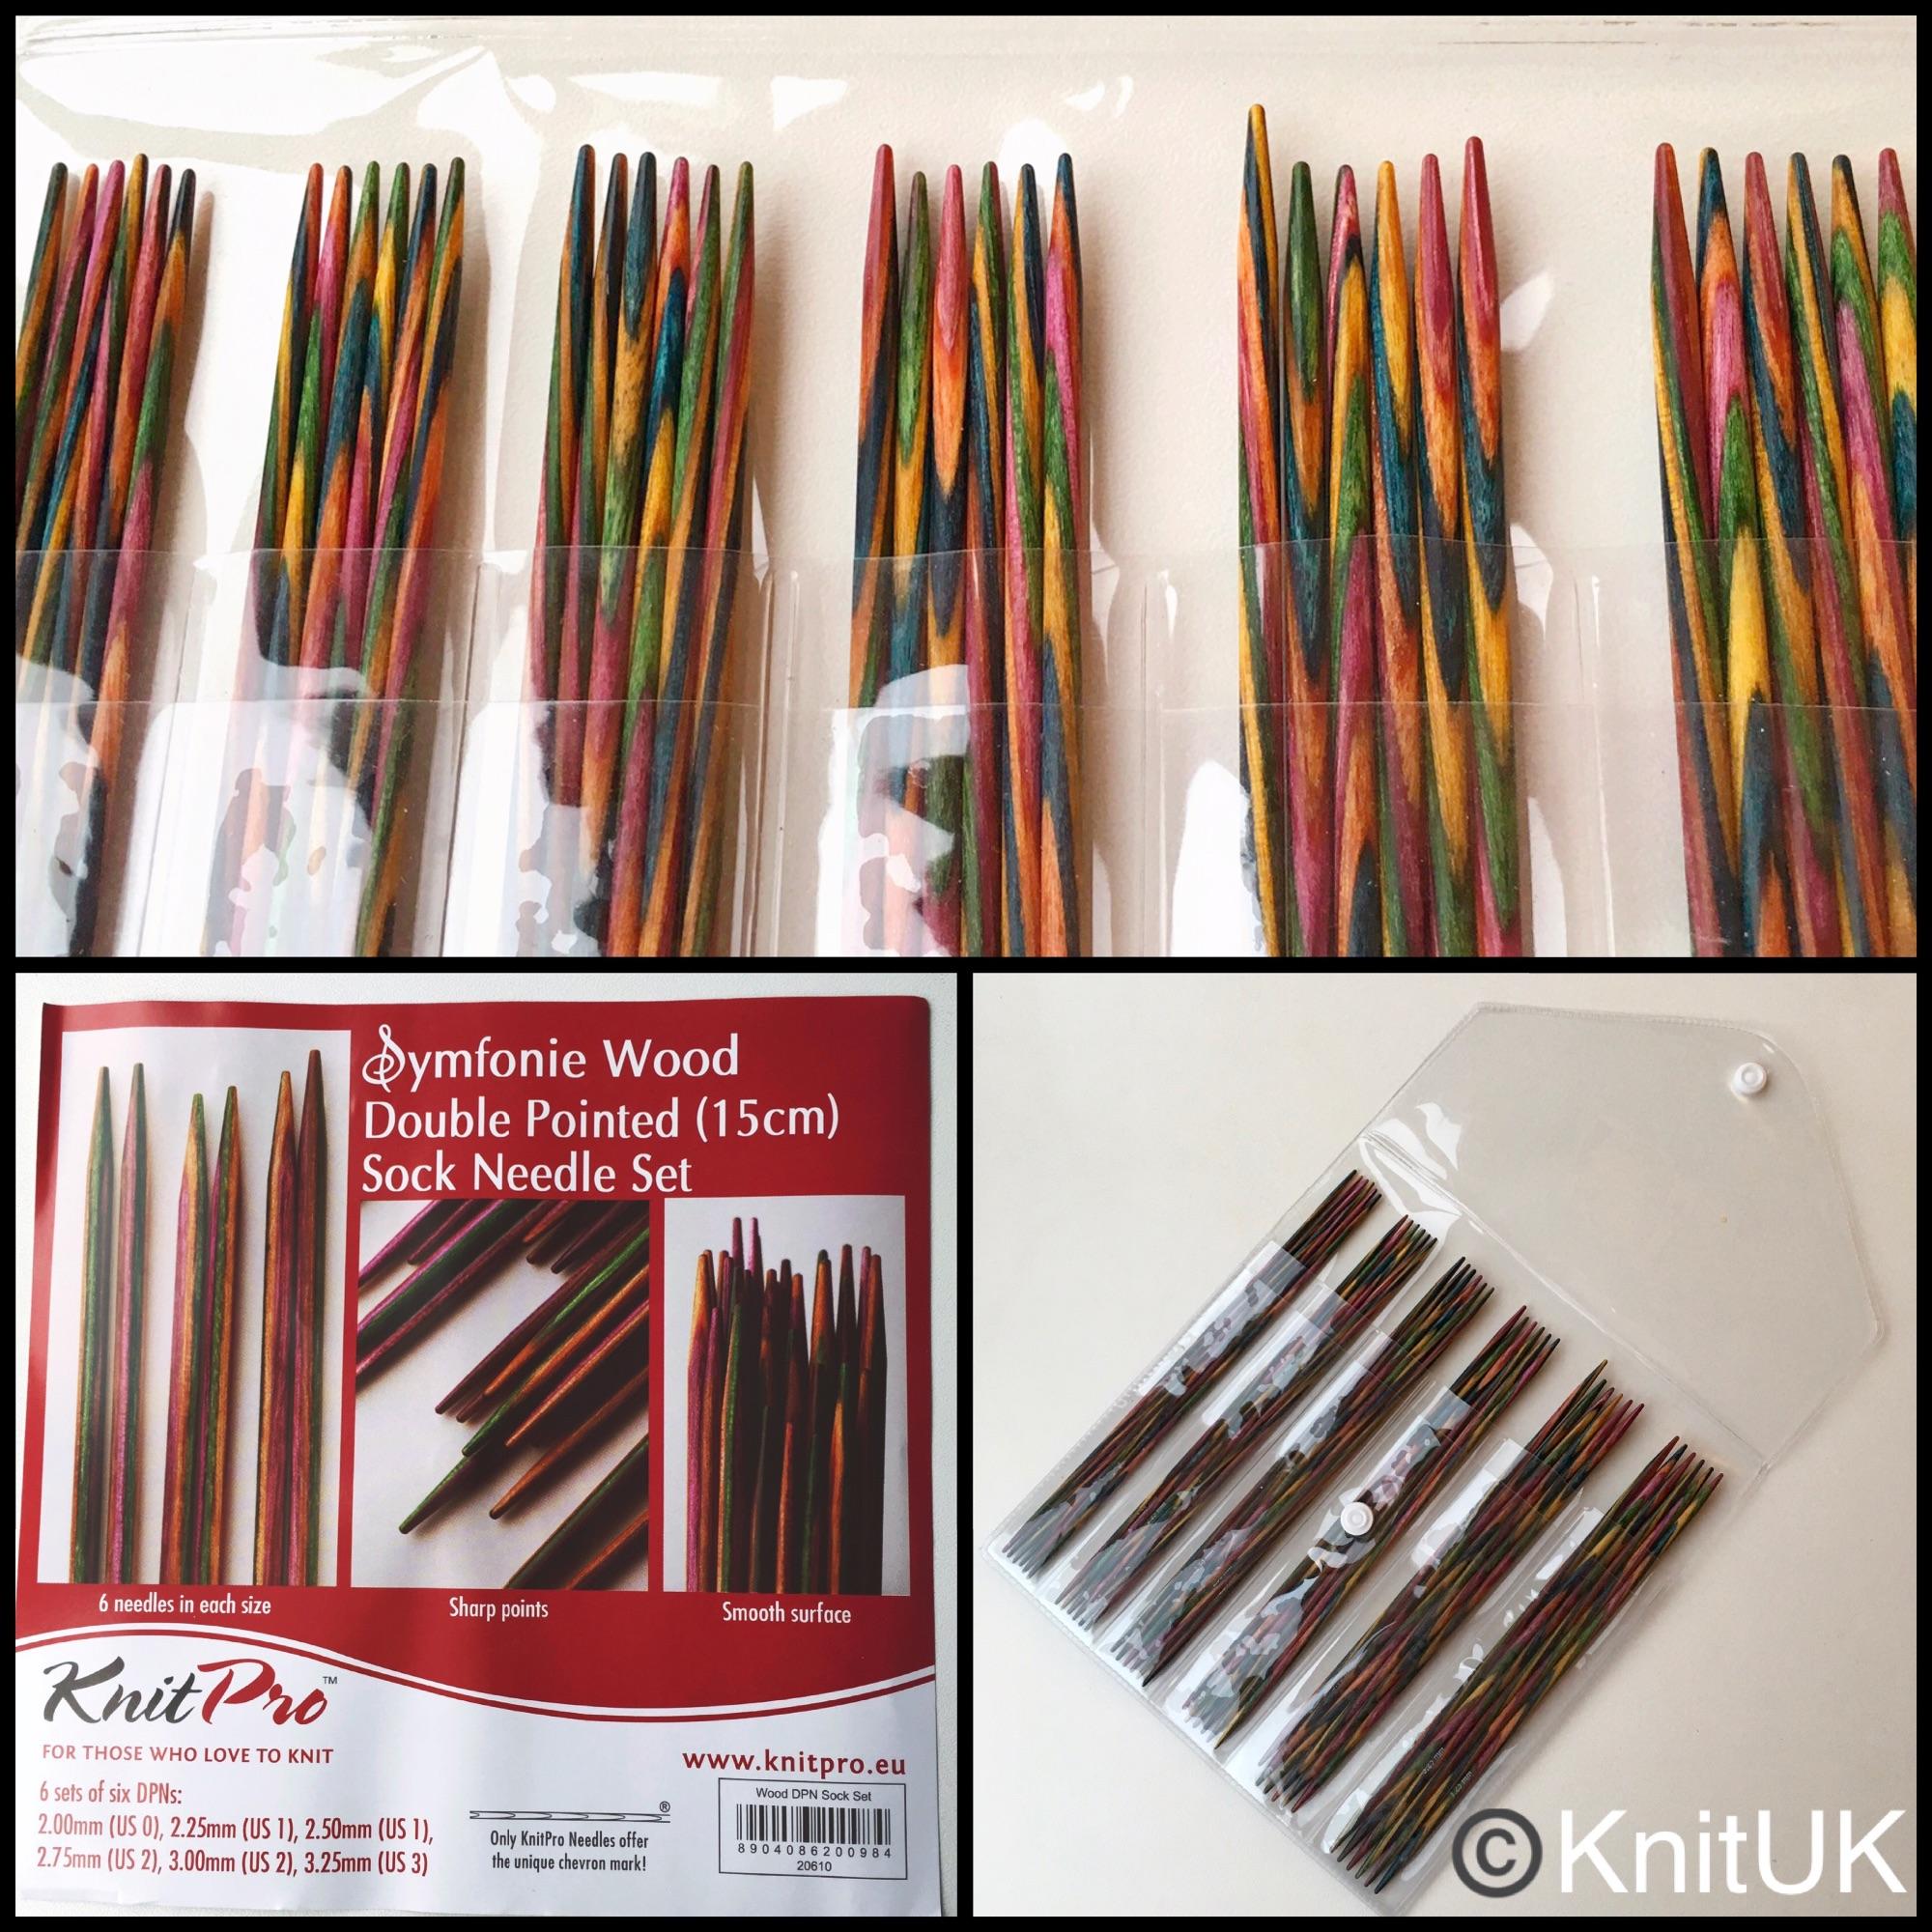 Knitpro symfonie double pointed socks knitting needles set of 6 15cm wooden